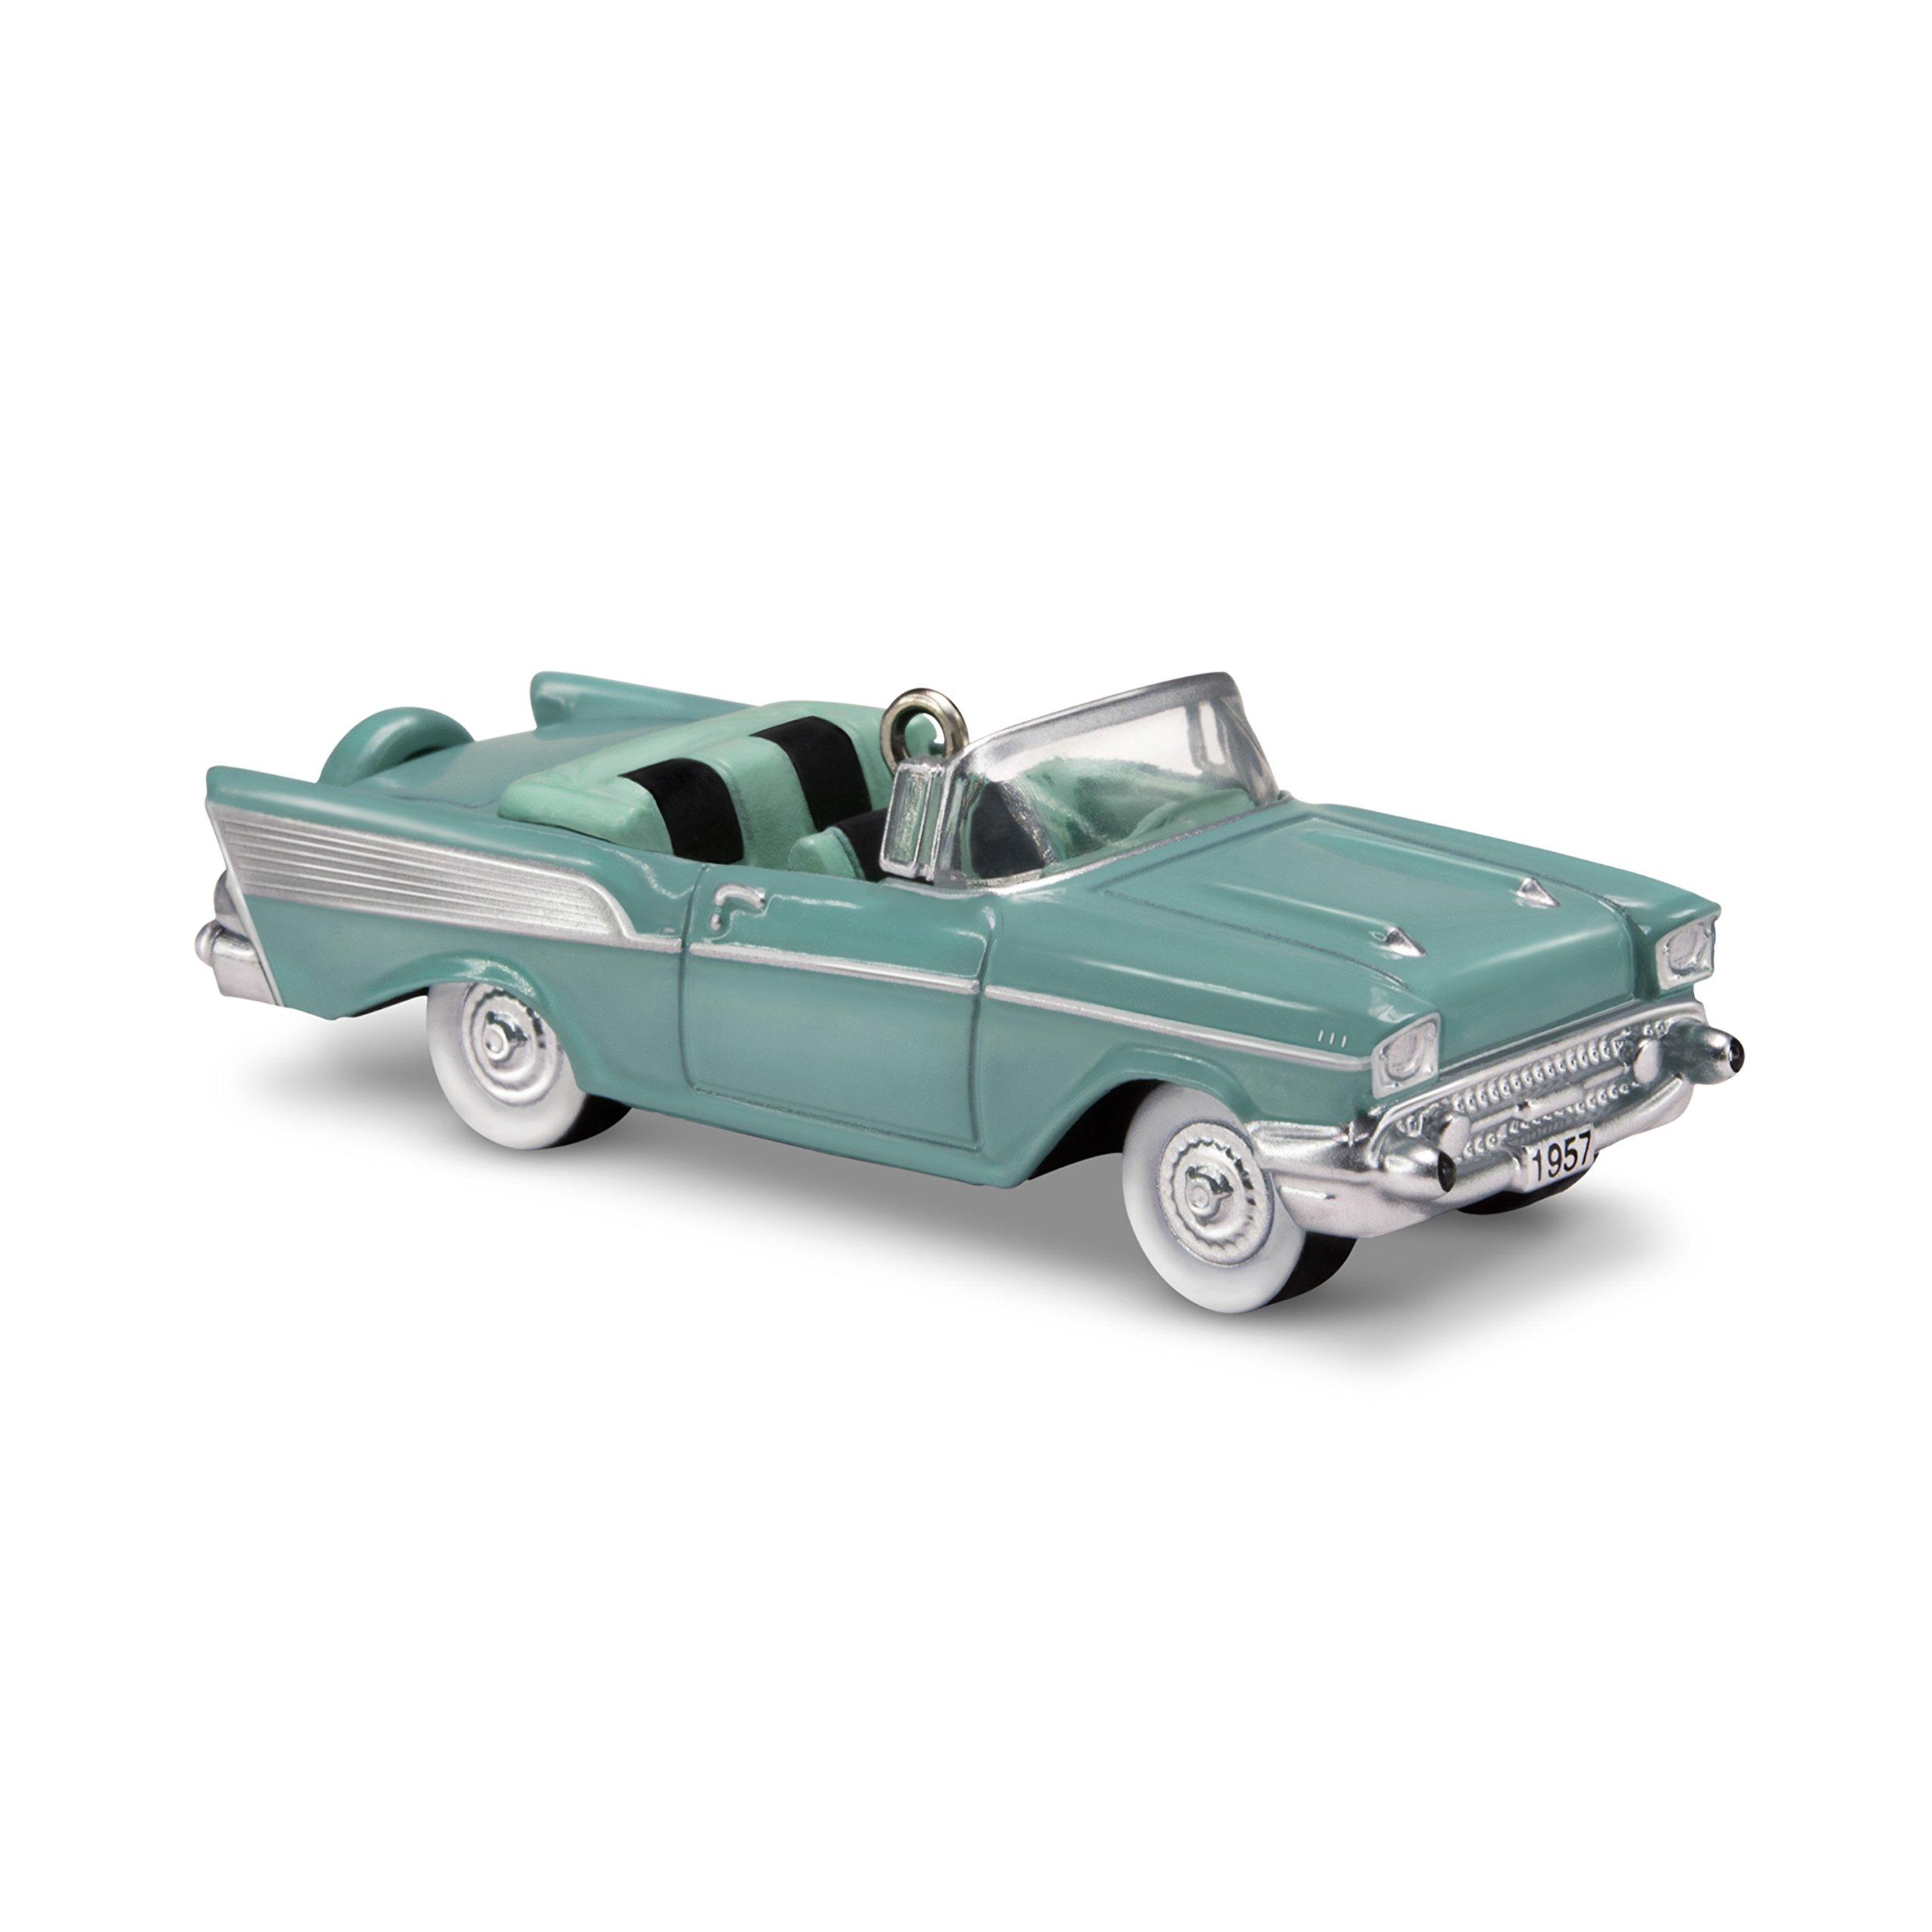 "Hallmark Keepsake Mini Ornament 2018 Year Dated, 1957 Chevrolet Bel Air Miniature , 2"""